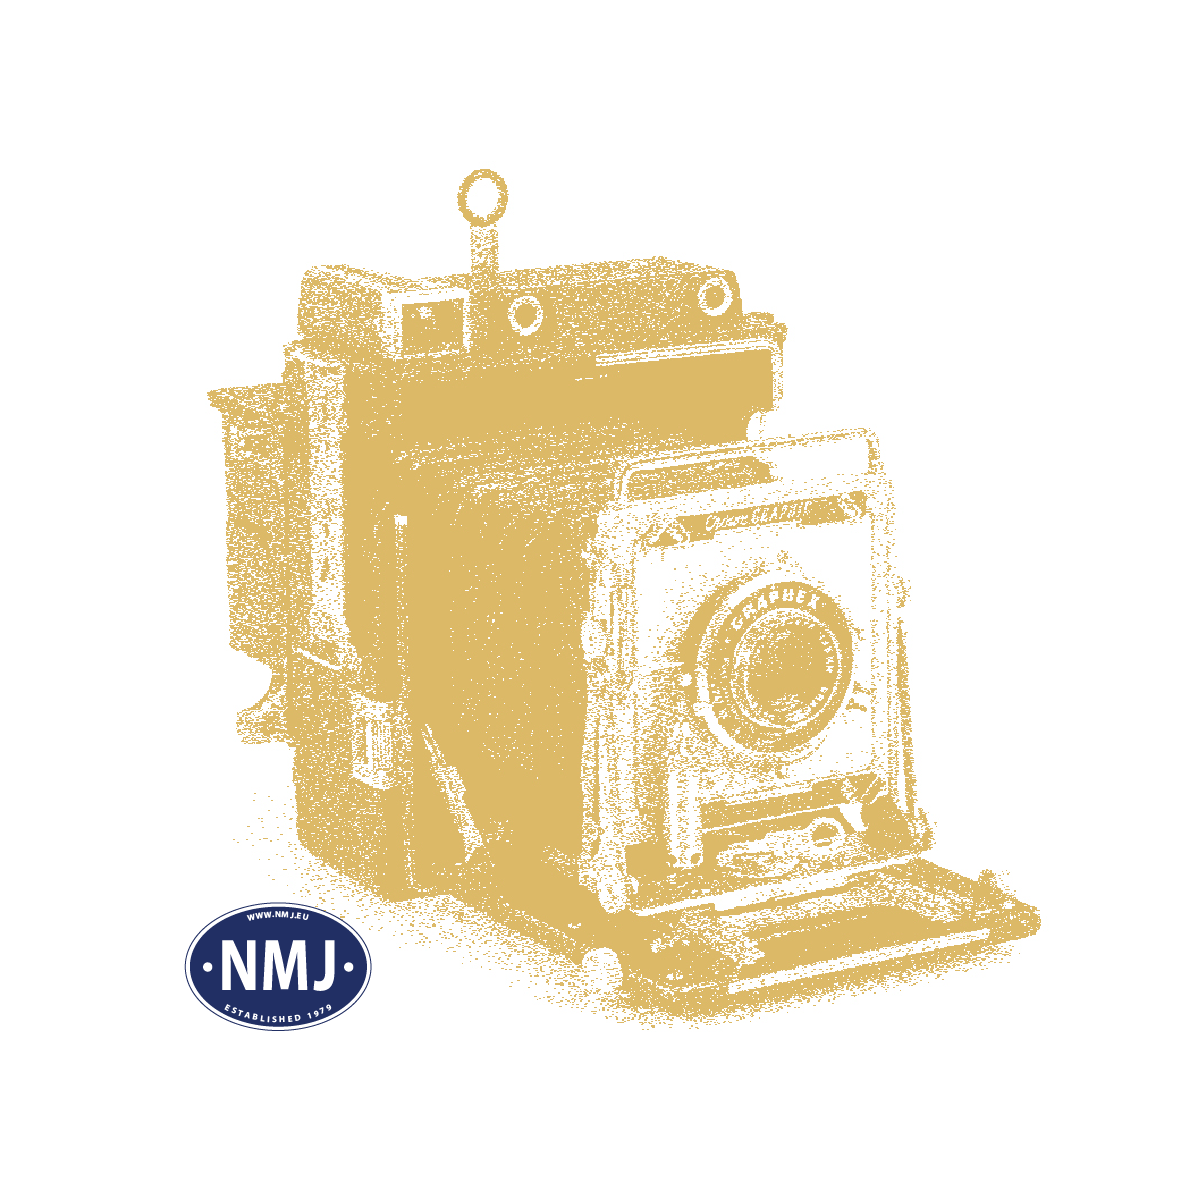 NMJT90013 - NMJ Topline NSB Di3a 614, Red/Brown Livery, DCC w/ Sound